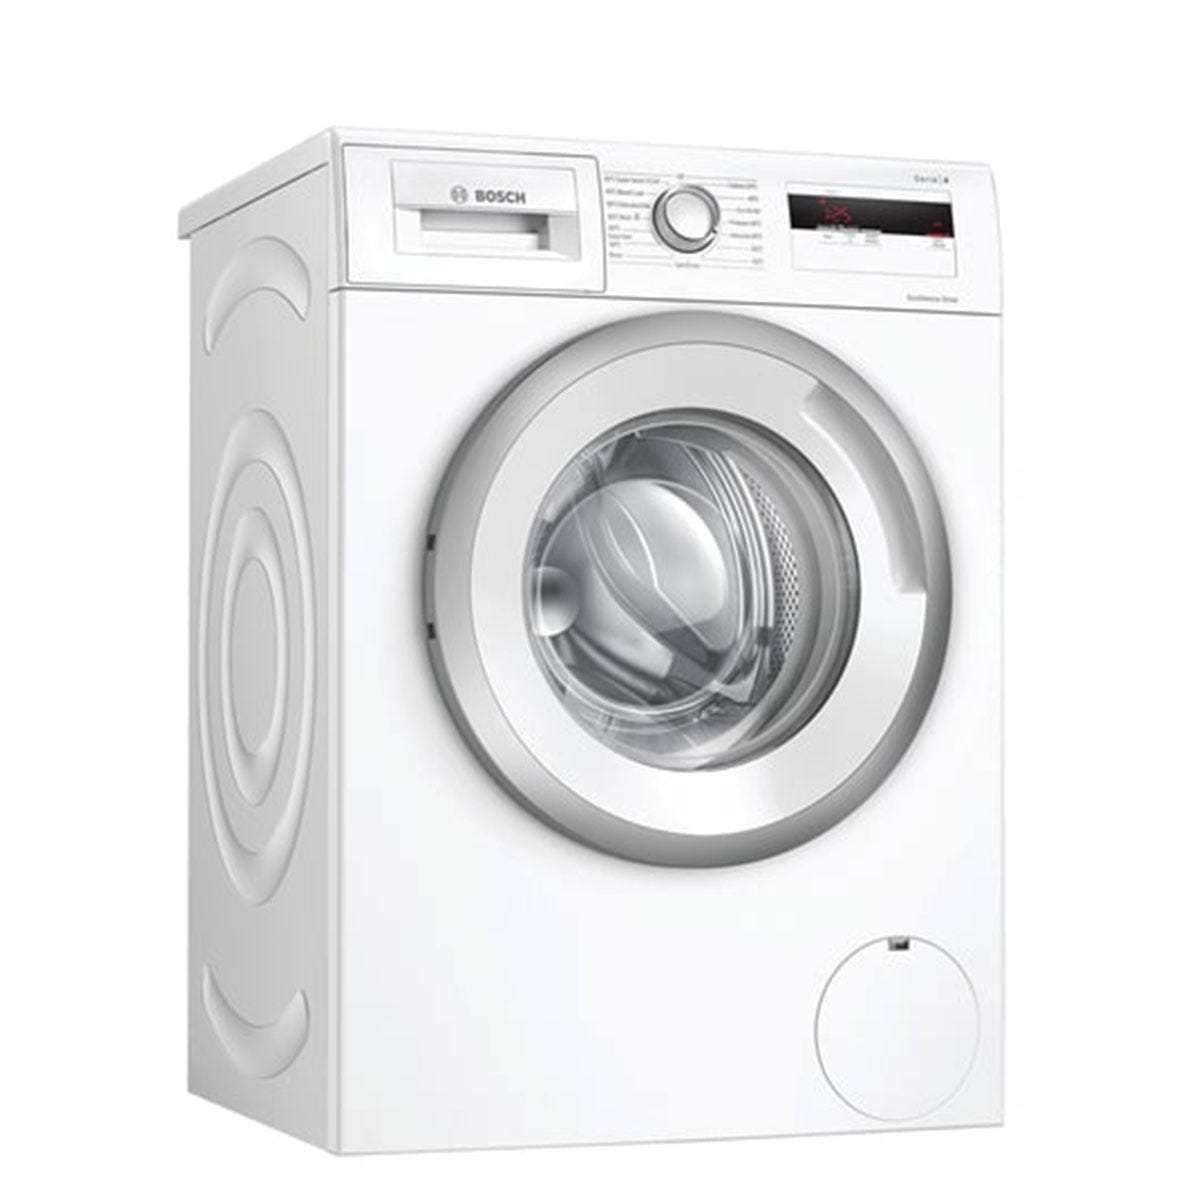 Bosch Serie 4 WAN28081GB 7kg Washing Machine with 1400rpm - White